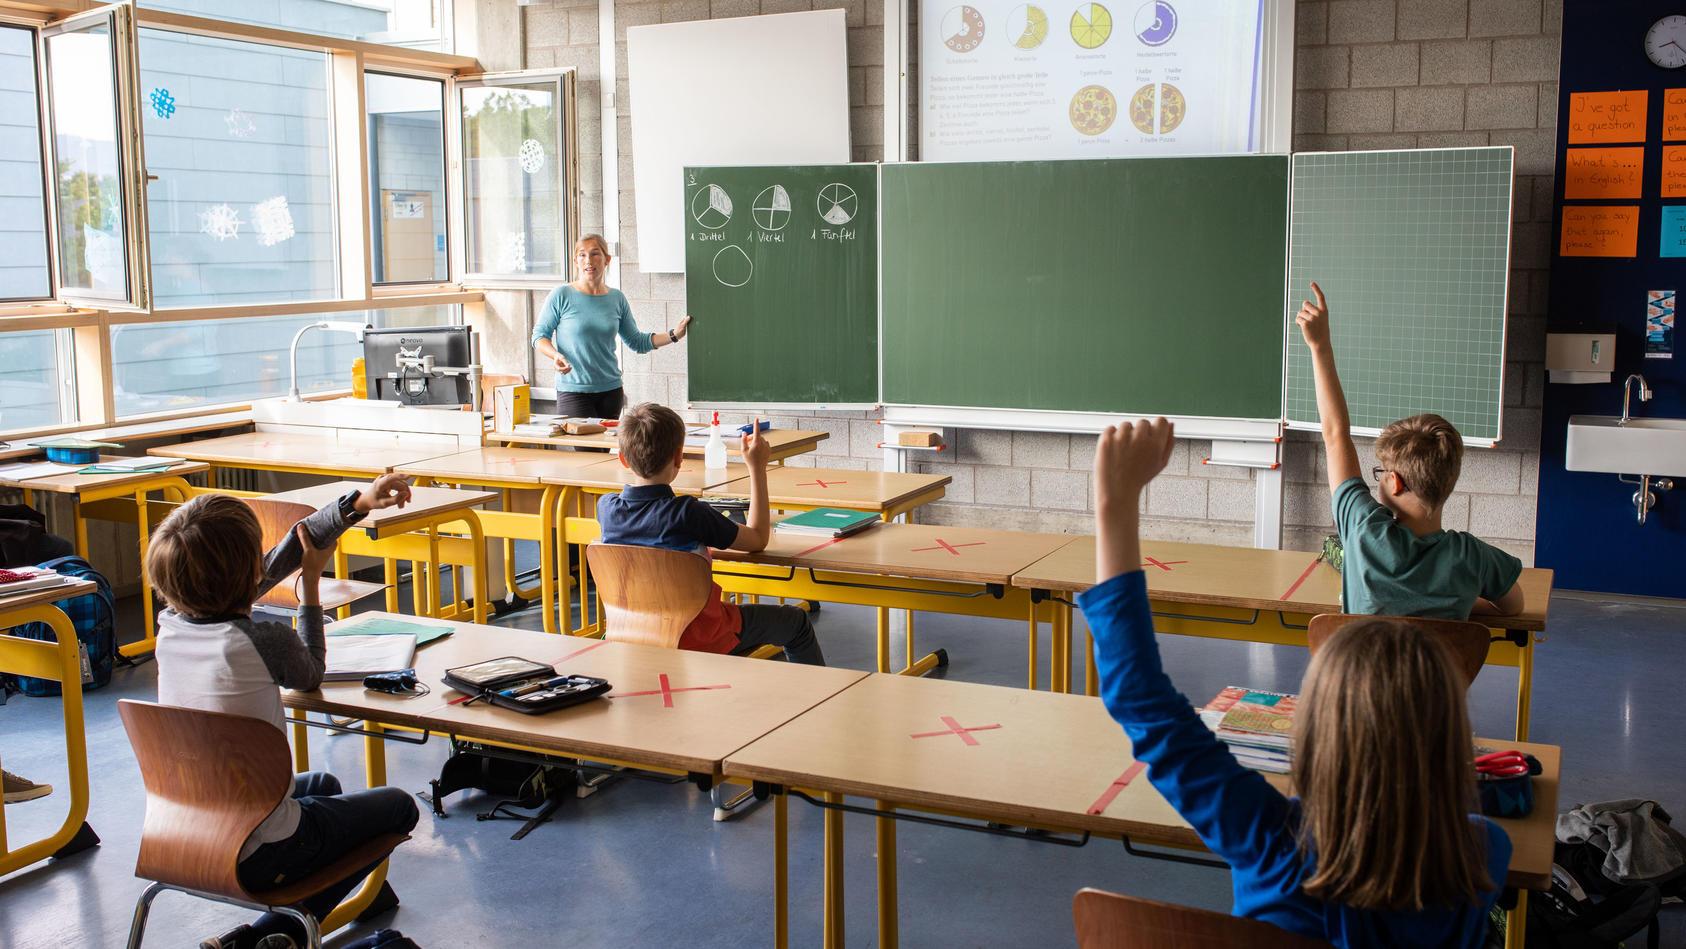 Lehrer kümmert sich um die Füße der Schüler